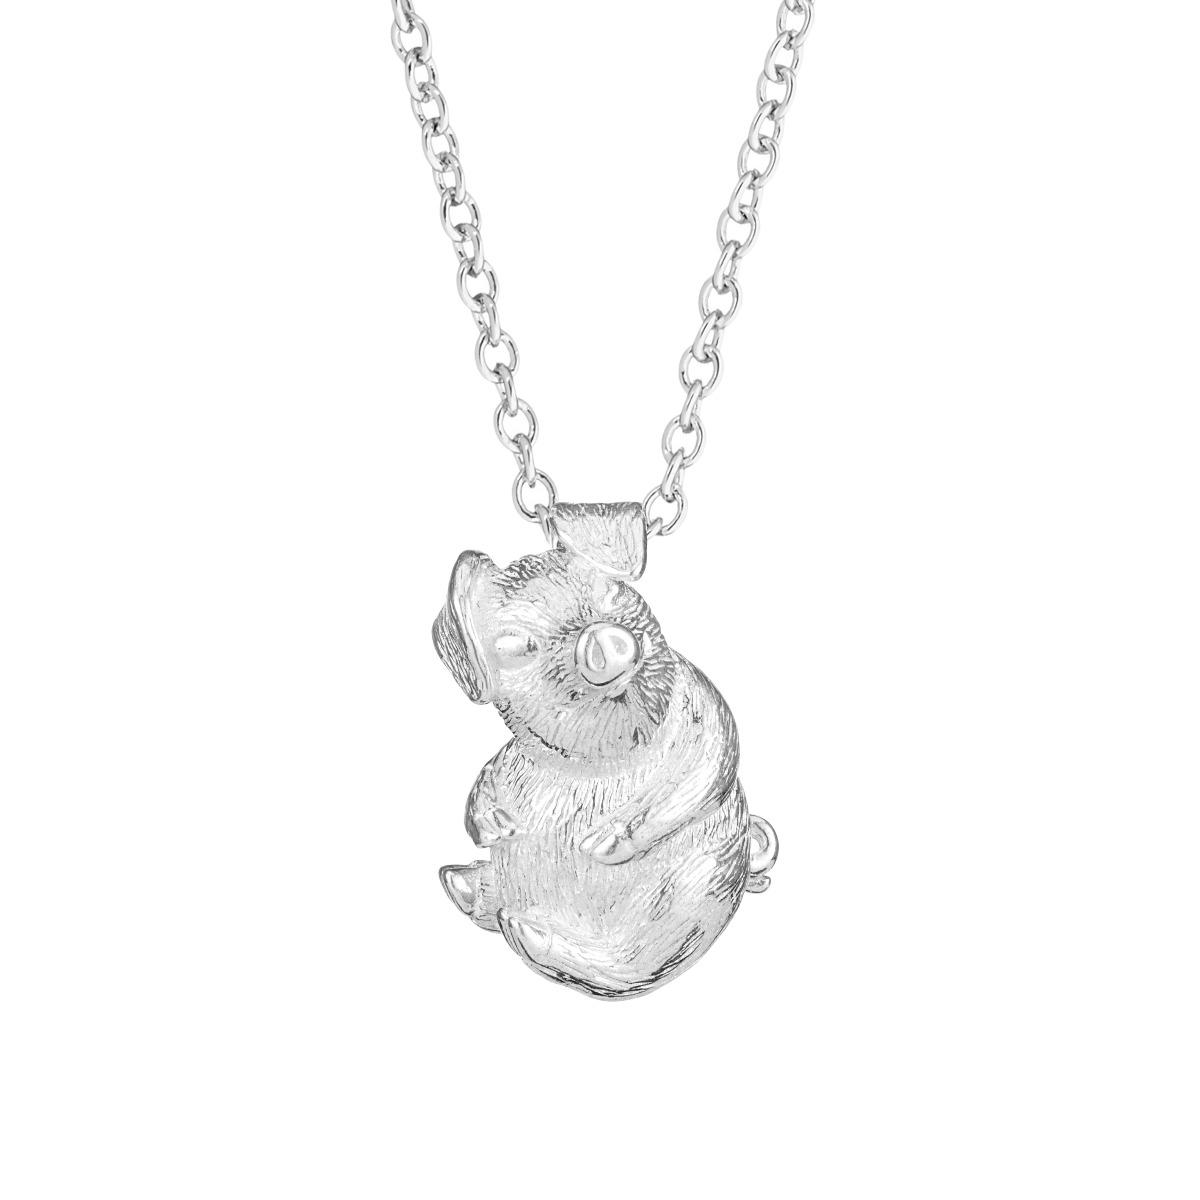 Chinese zodiac pendant necklace (pig)